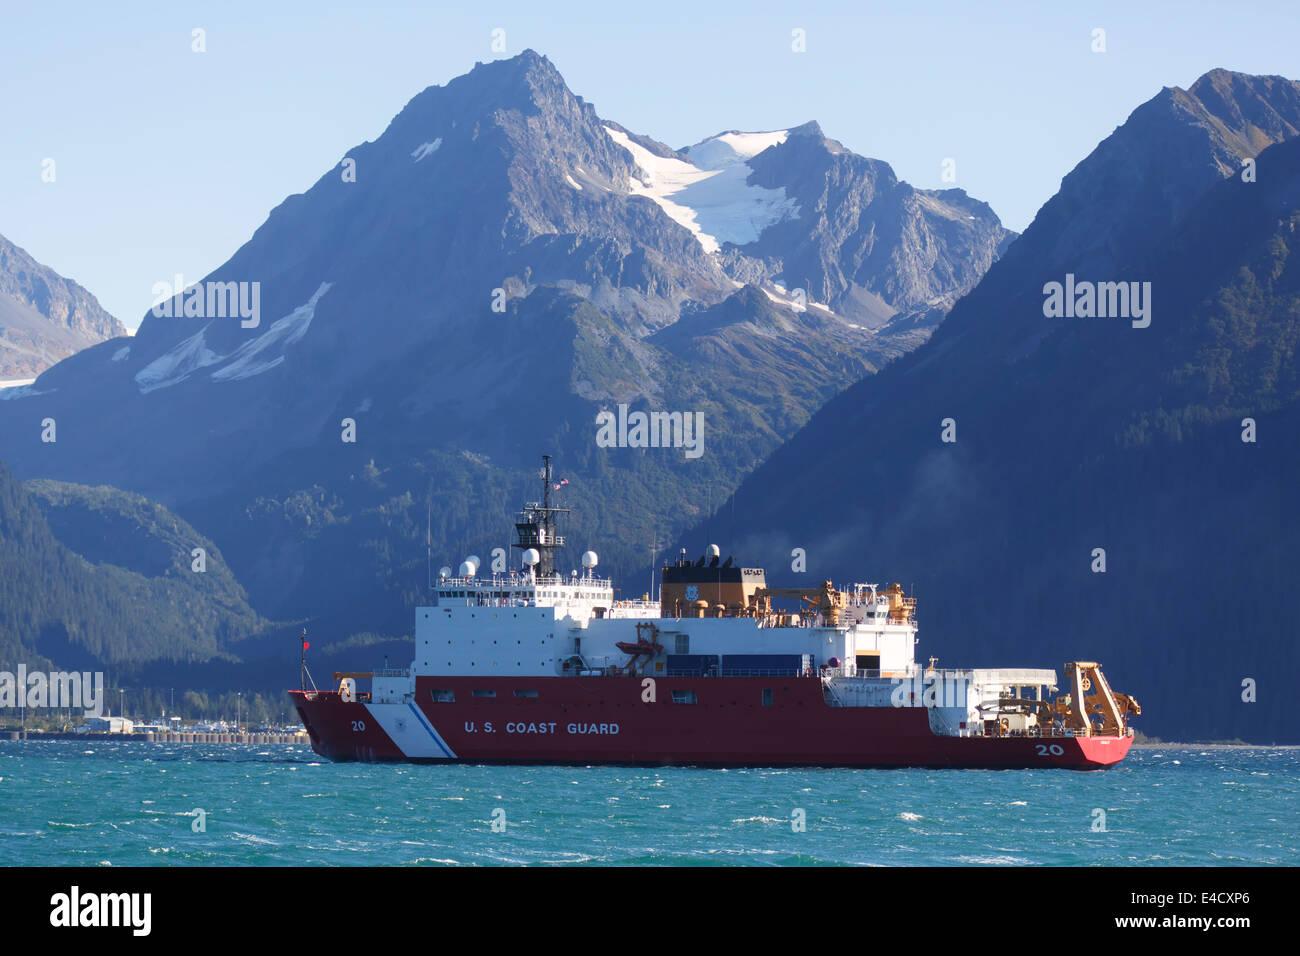 Coast Guard ship Healy, Resurrection Bay, Seward, Alaska. - Stock Image